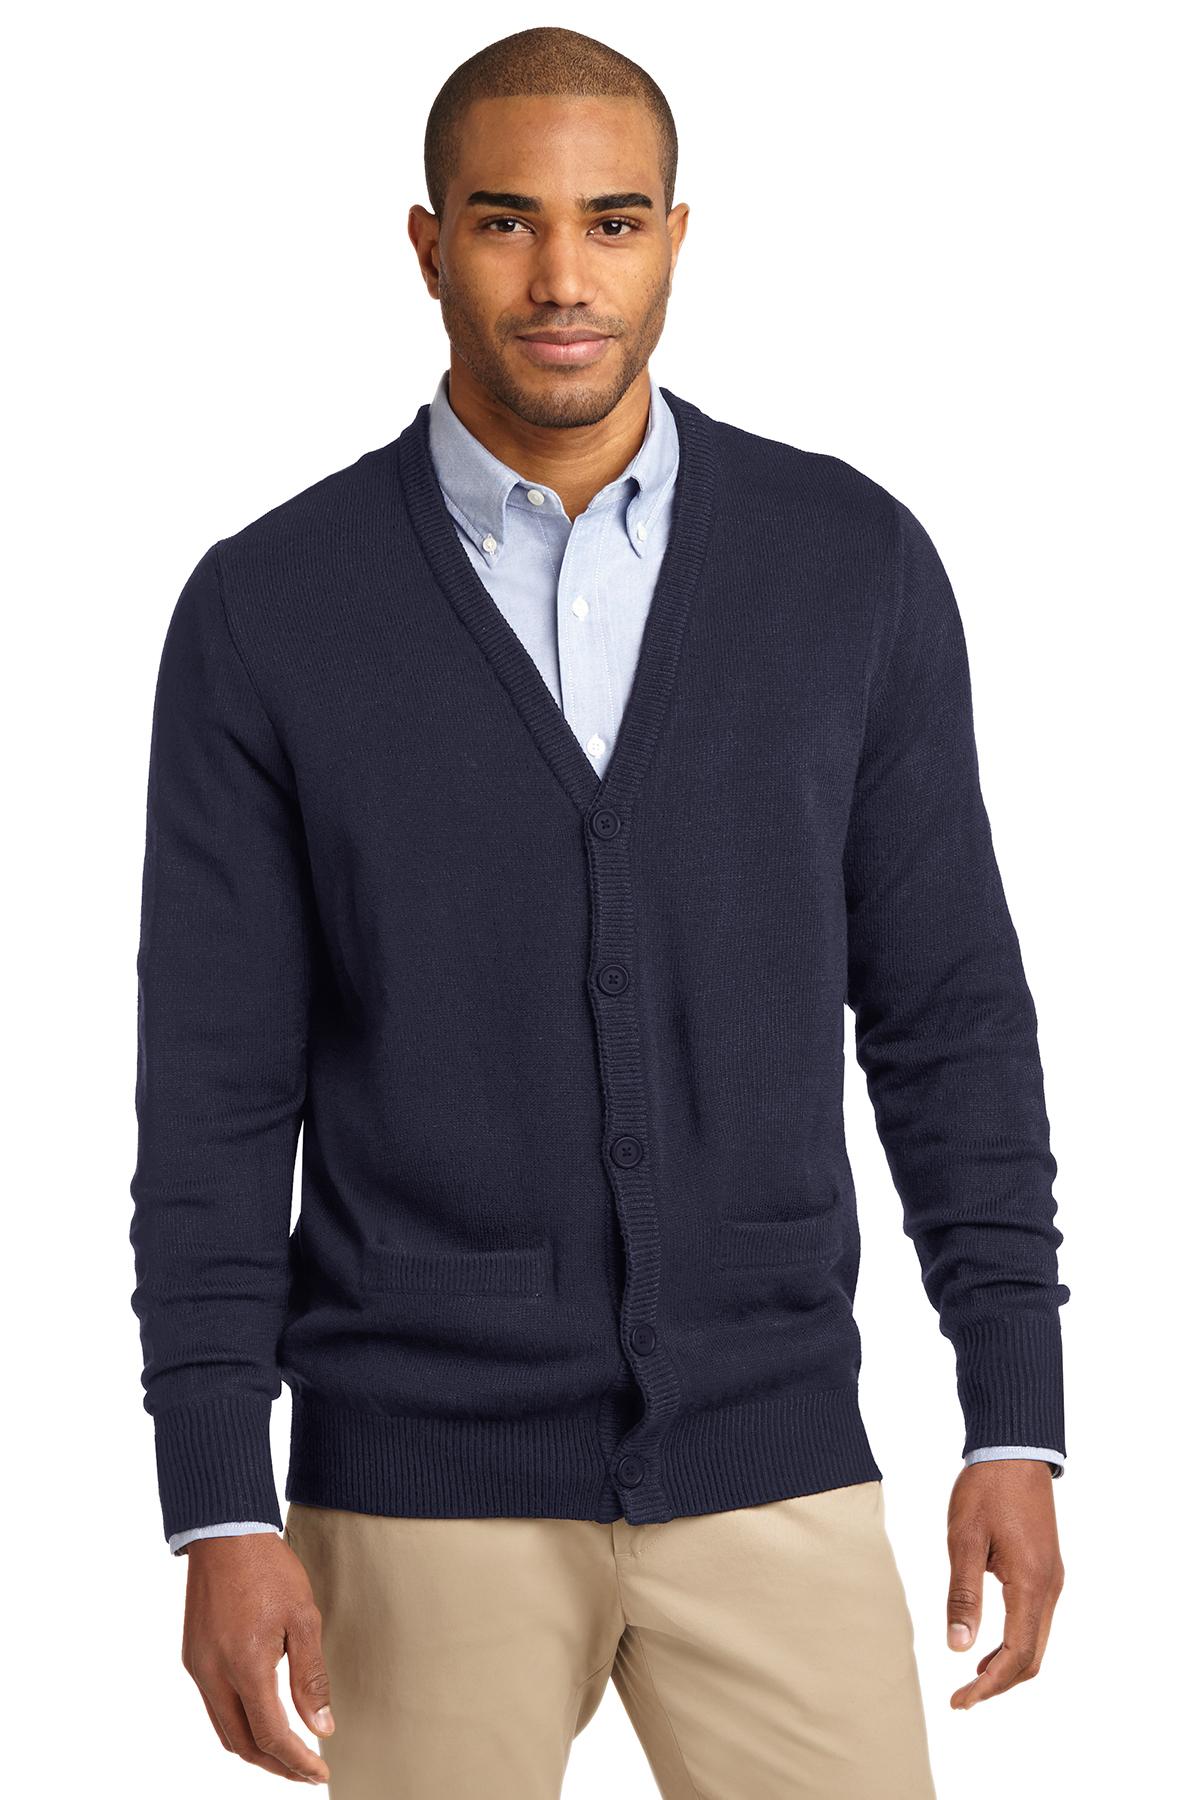 27cd1c3a23fd Port Authority LSW304 Ladies Value Jewel-Neck Cardigan Sweater ...